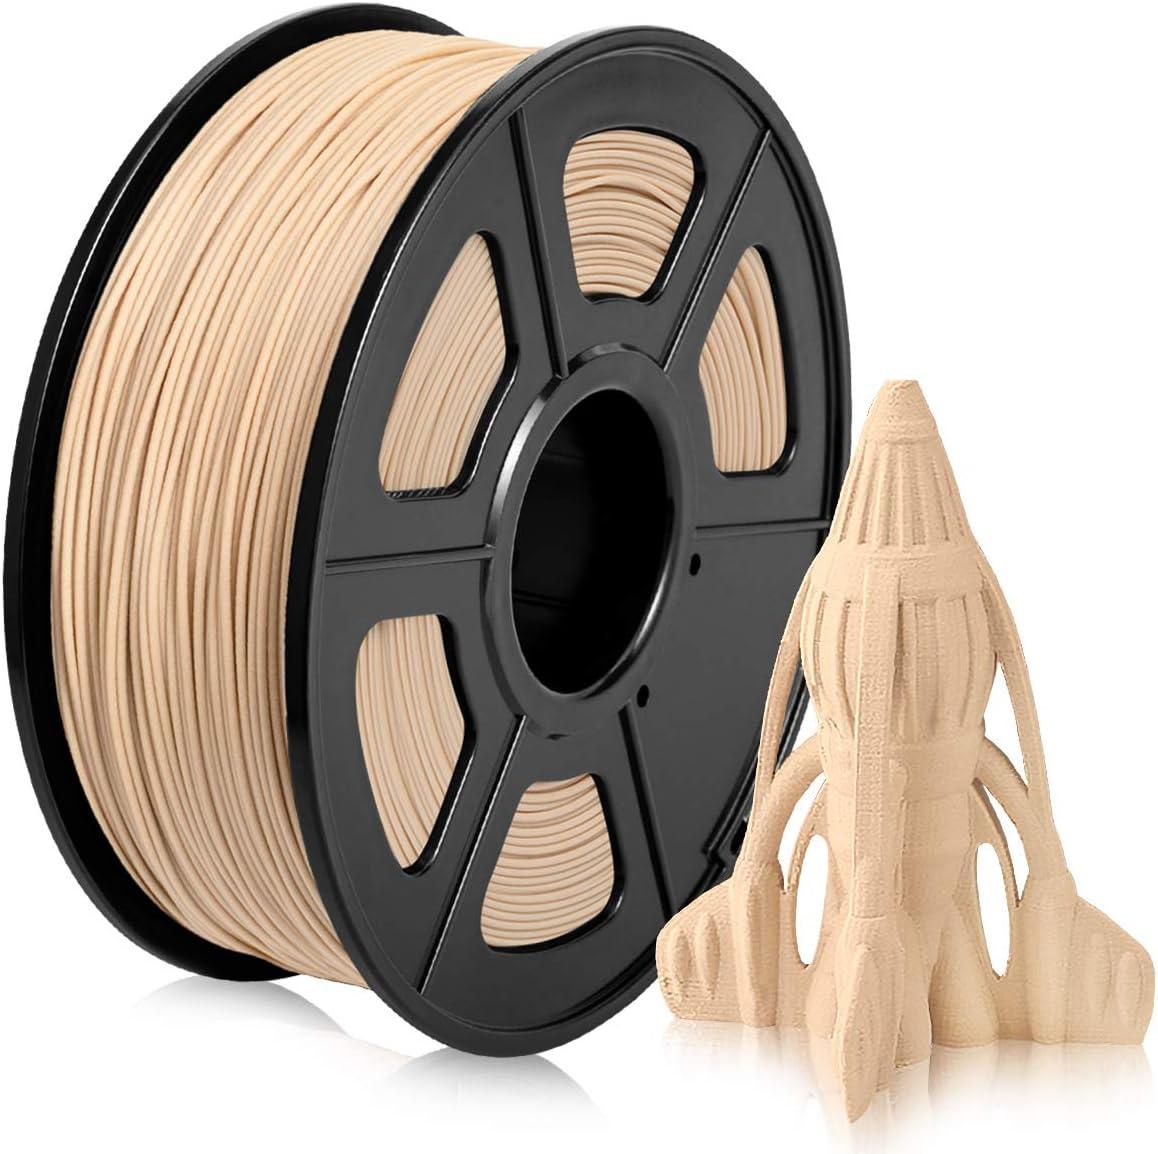 Wood PLA Filament 1.75mm, Low Printing Temp Wood Texture PLA 3D Filament, 20% Wood Fiber Filled PLA Wood Filament 1KG (2.2 lb) Wood Color